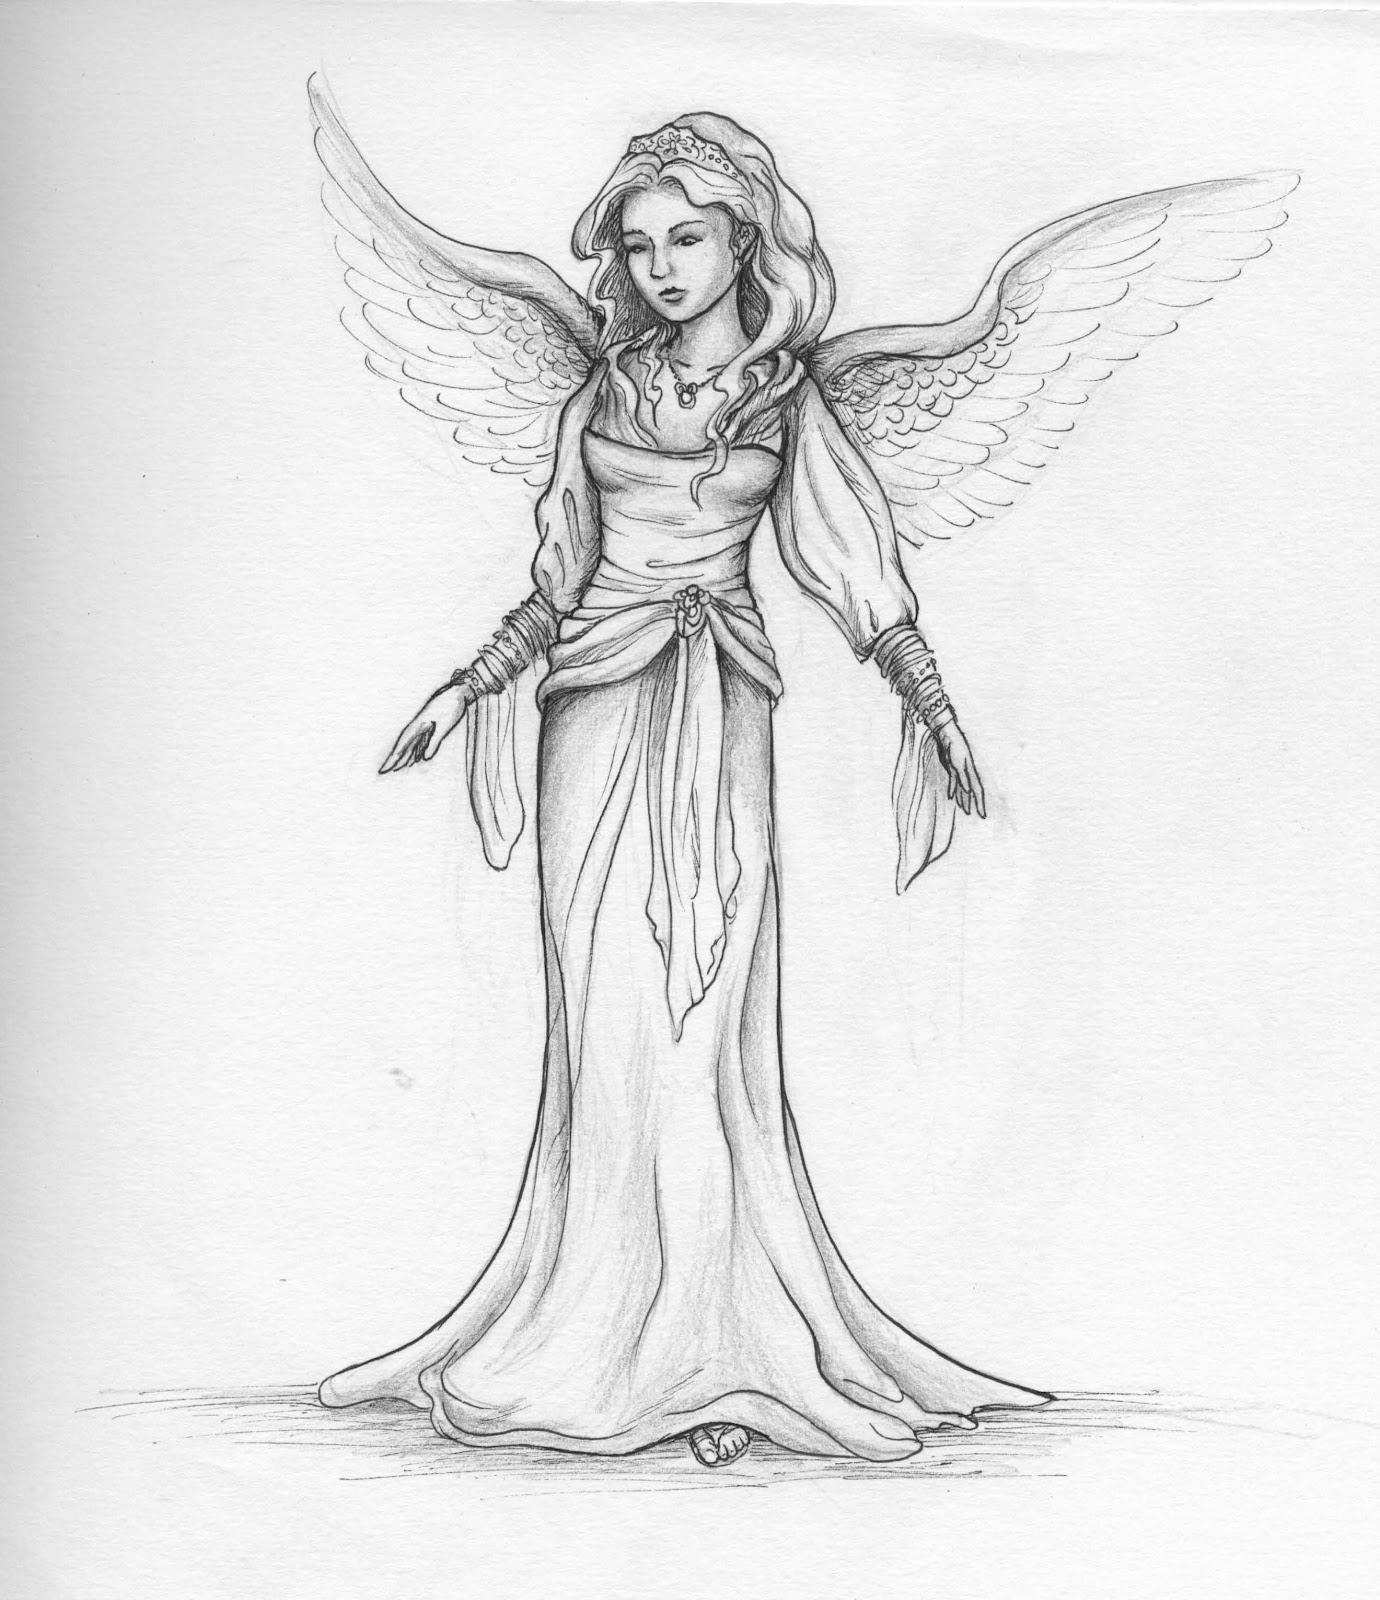 1380x1600 Pencil Sketches Of Angels